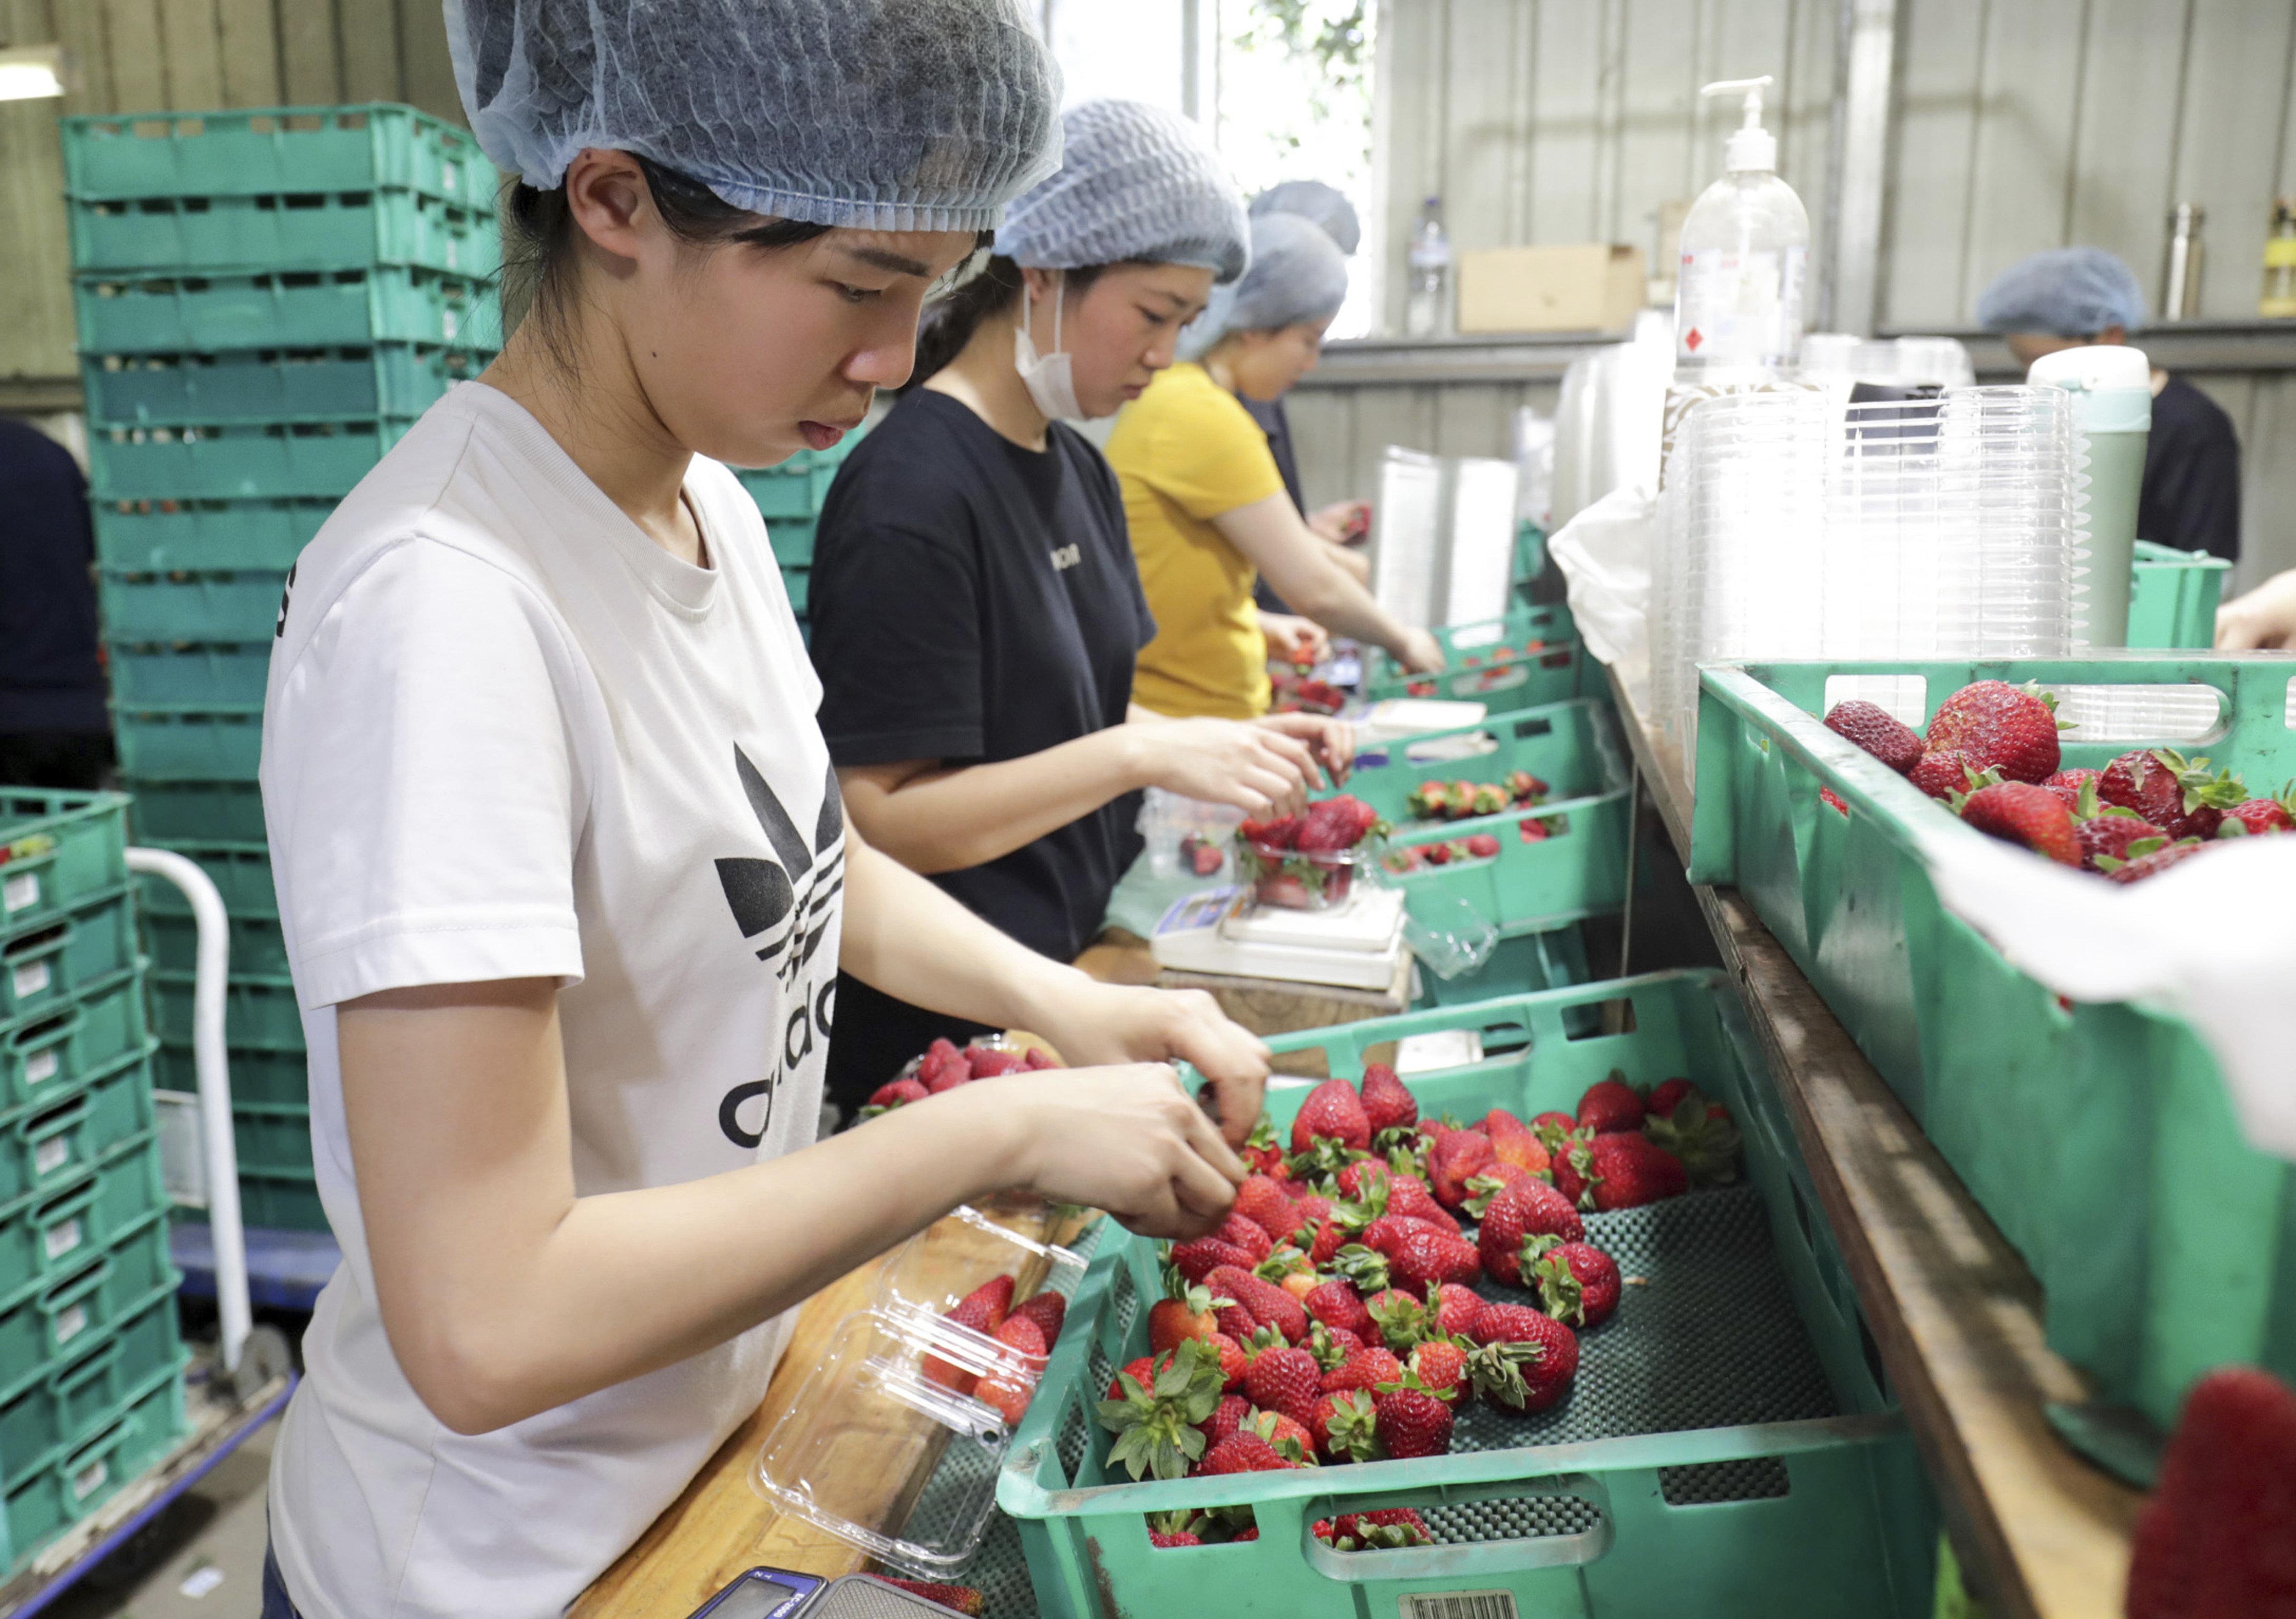 Australian Strawberry Needle Suspect 'Motivated By Spite Or Revenge', Court